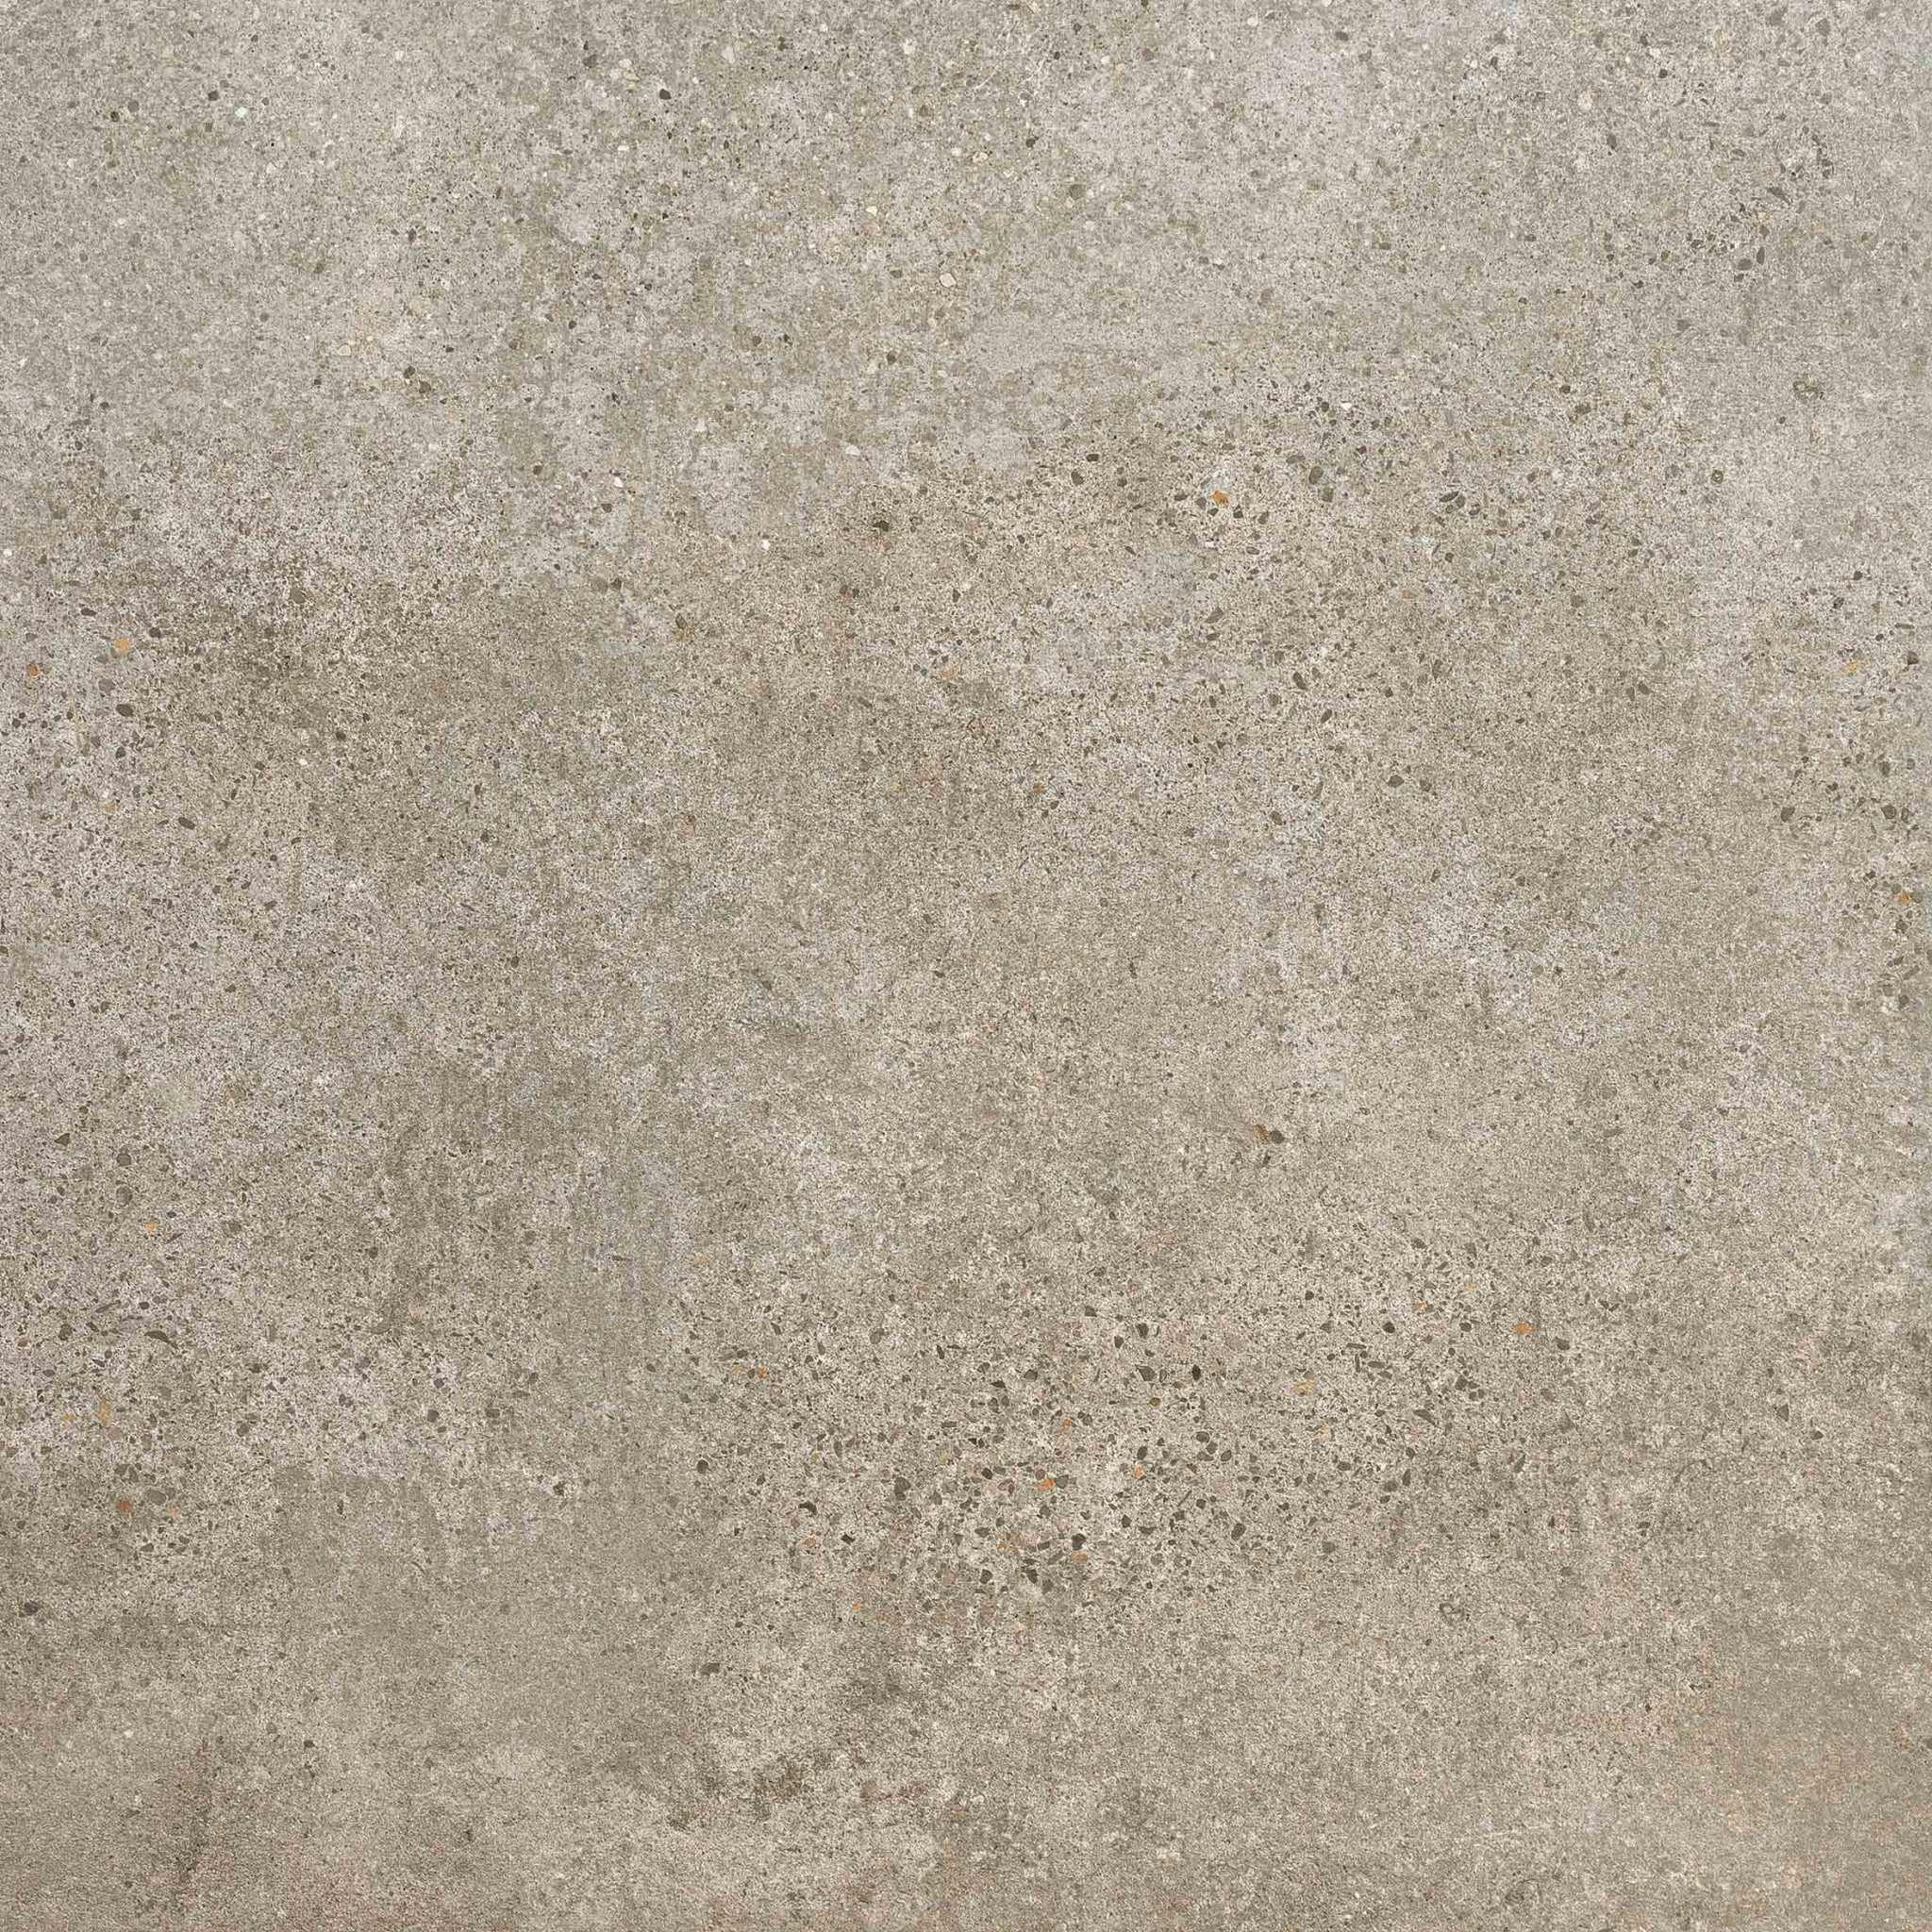 Hdg Pietra Stone Finish Pavers Urban Block Slate Hdg